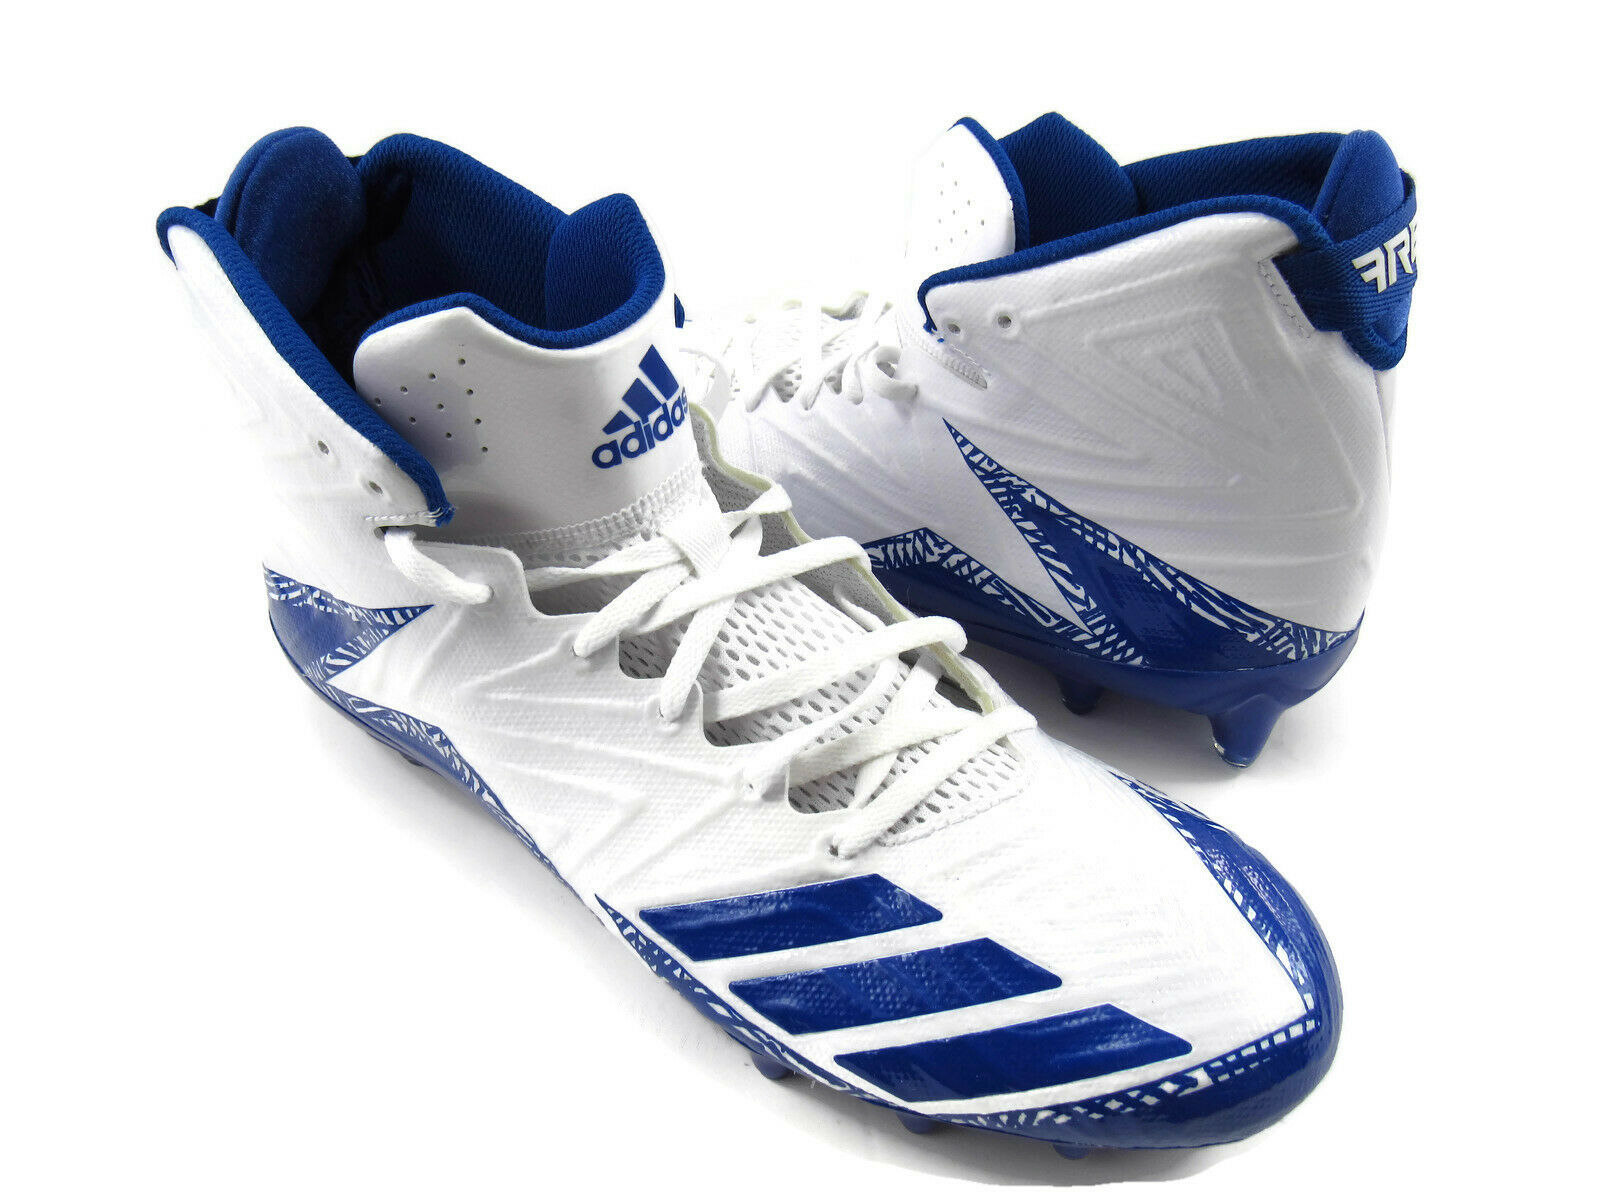 Adidas 117745378 Freak Men's Football Cleats White   blueee US Size 12 New